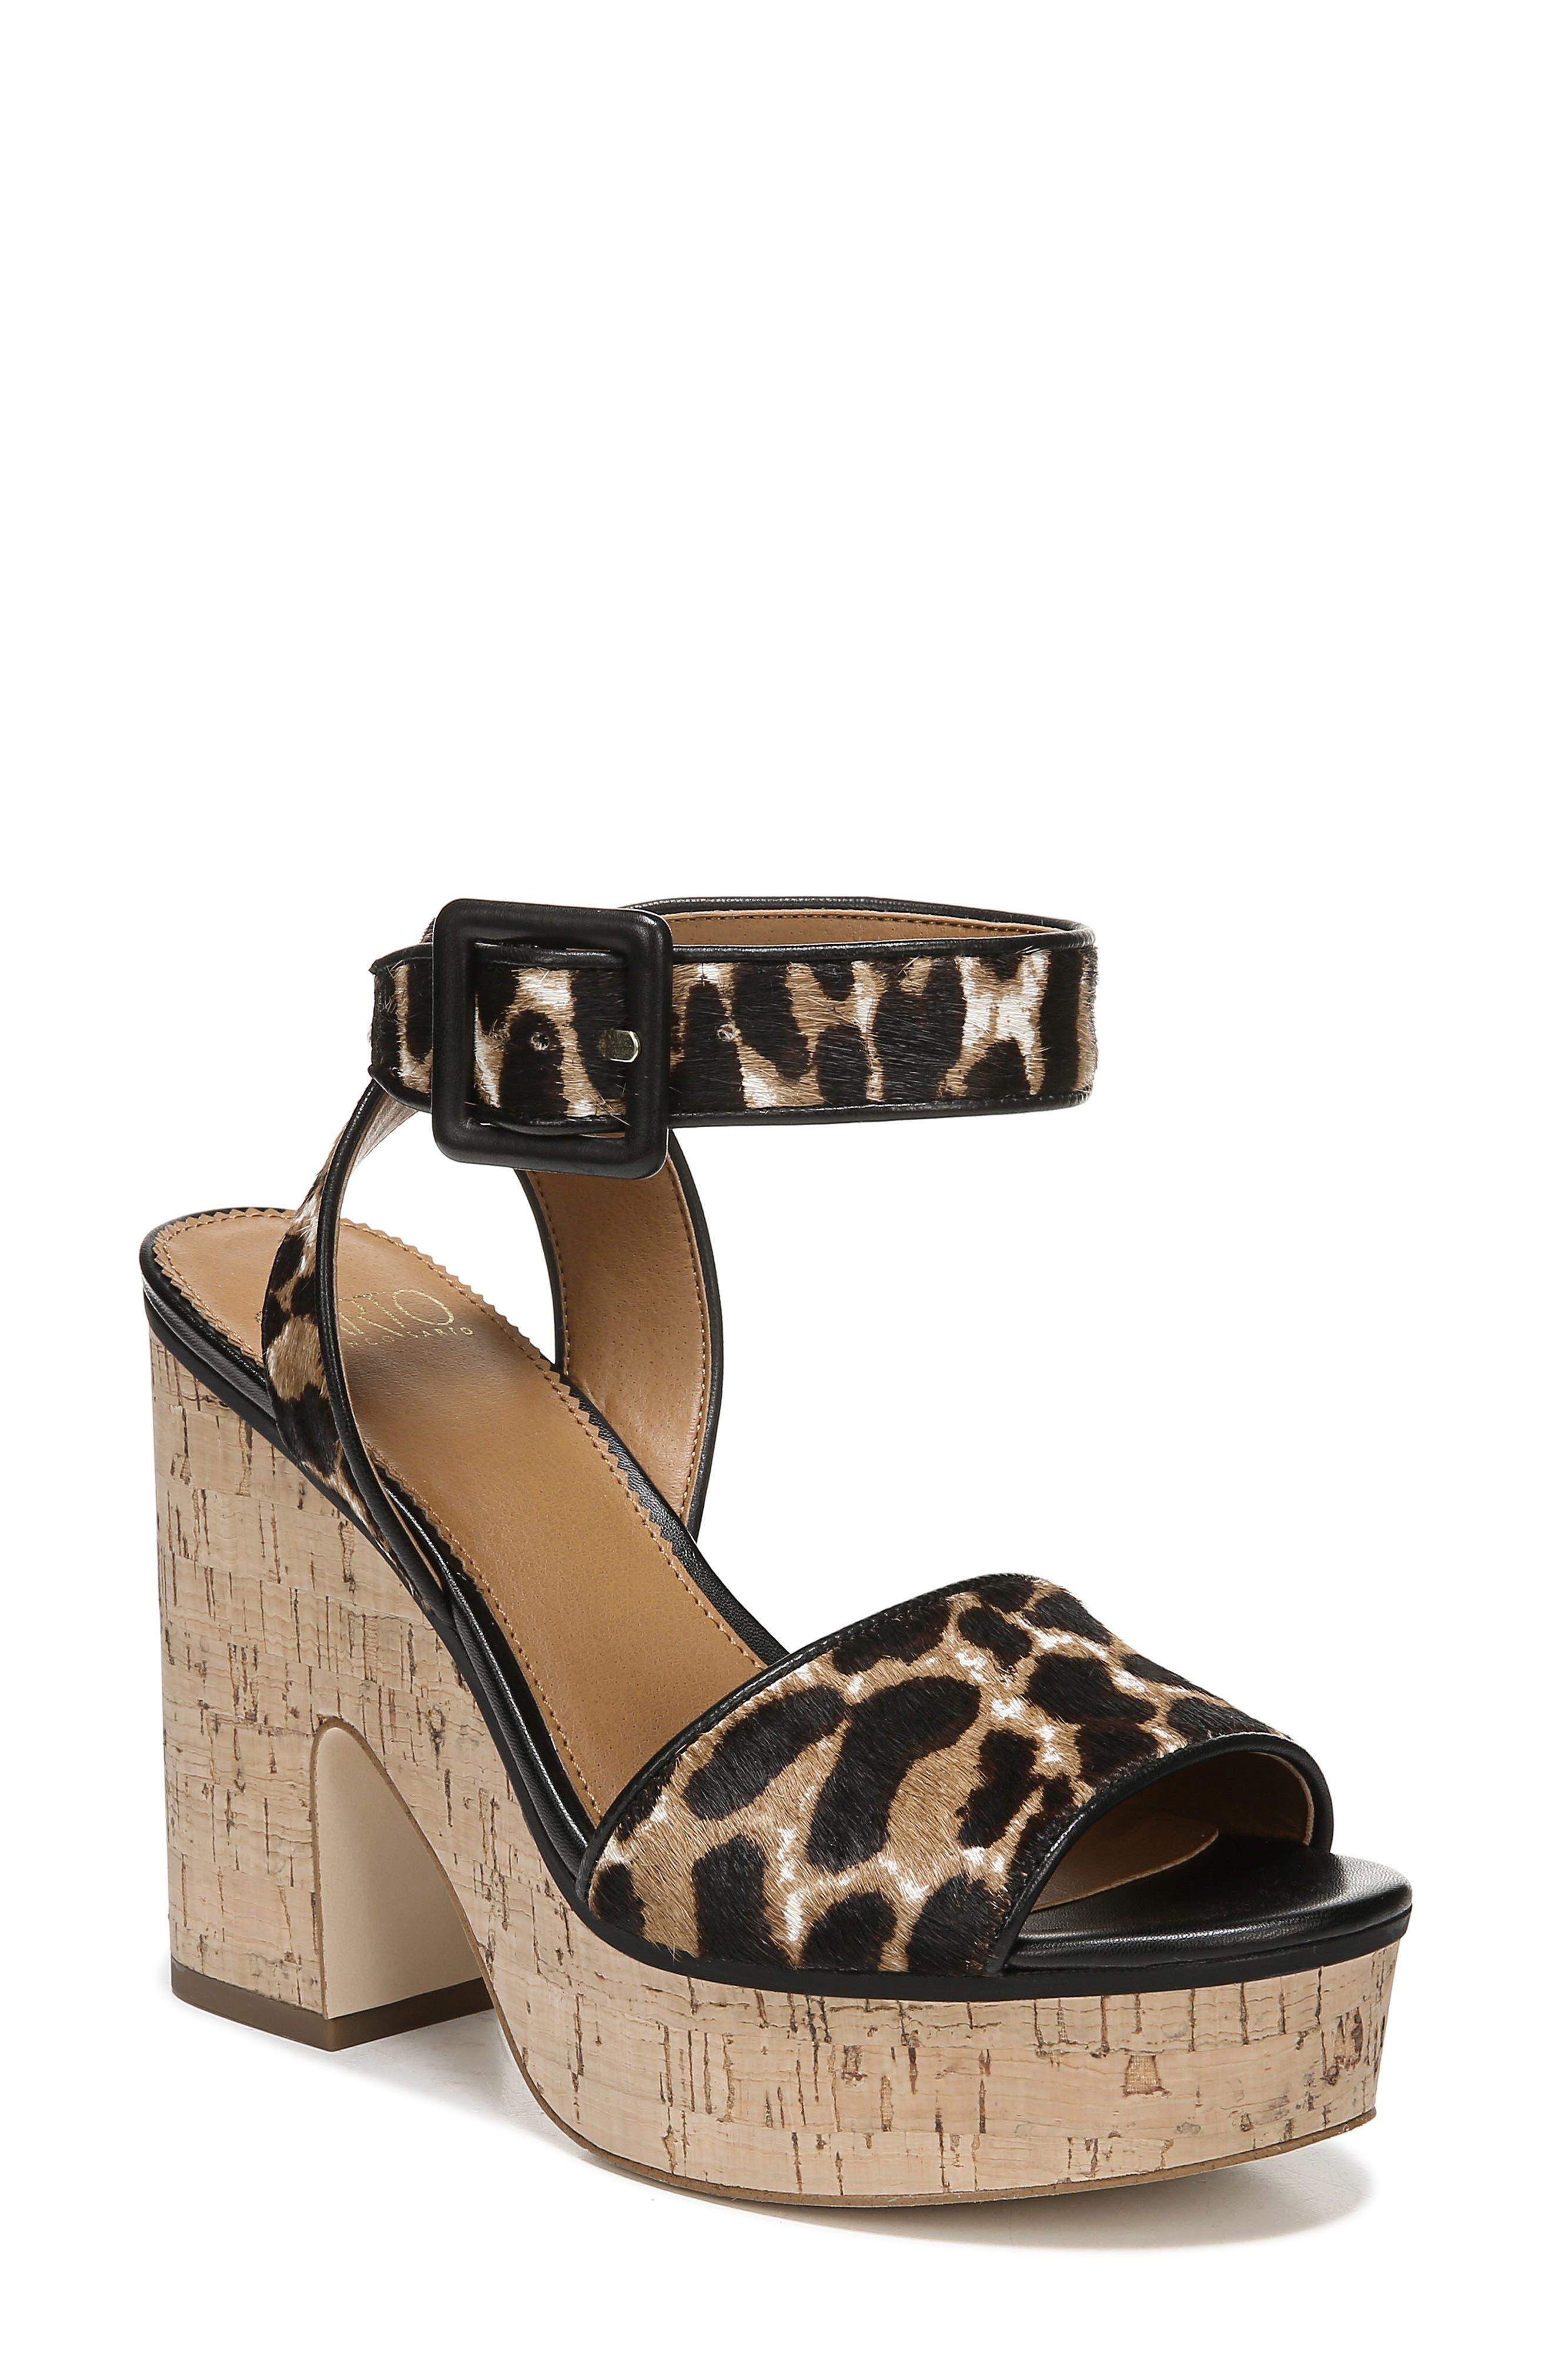 Sarto By Franco Sarto Franny Platform Sandal- Black